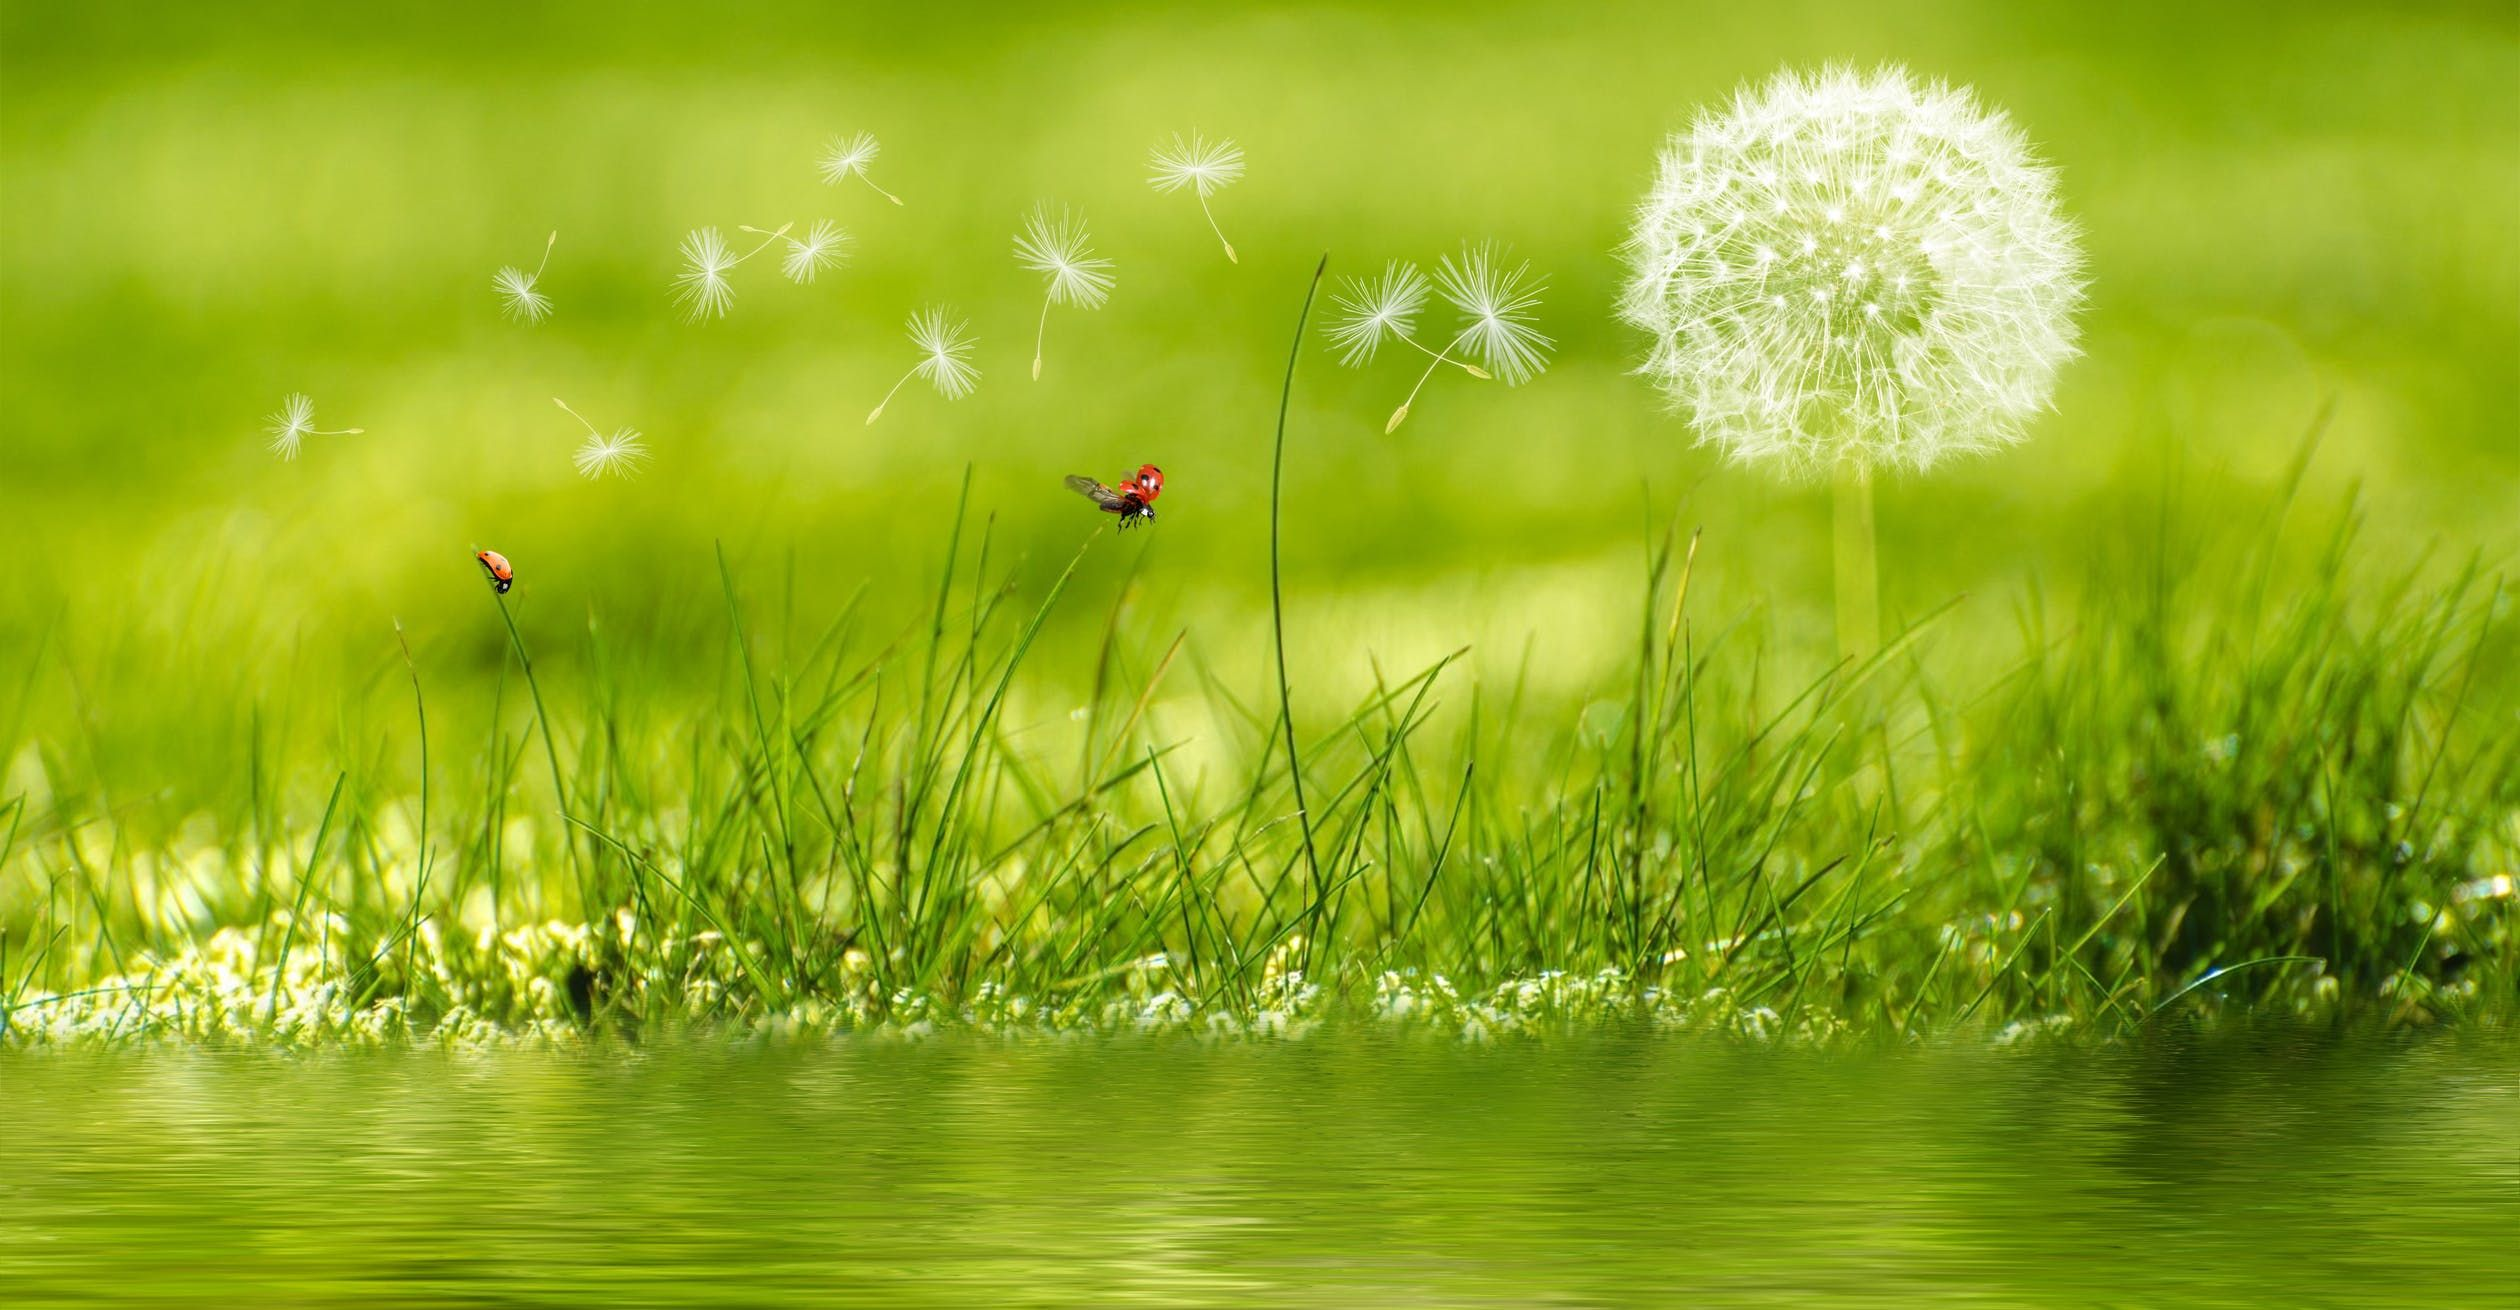 grass with wish flower.jpeg